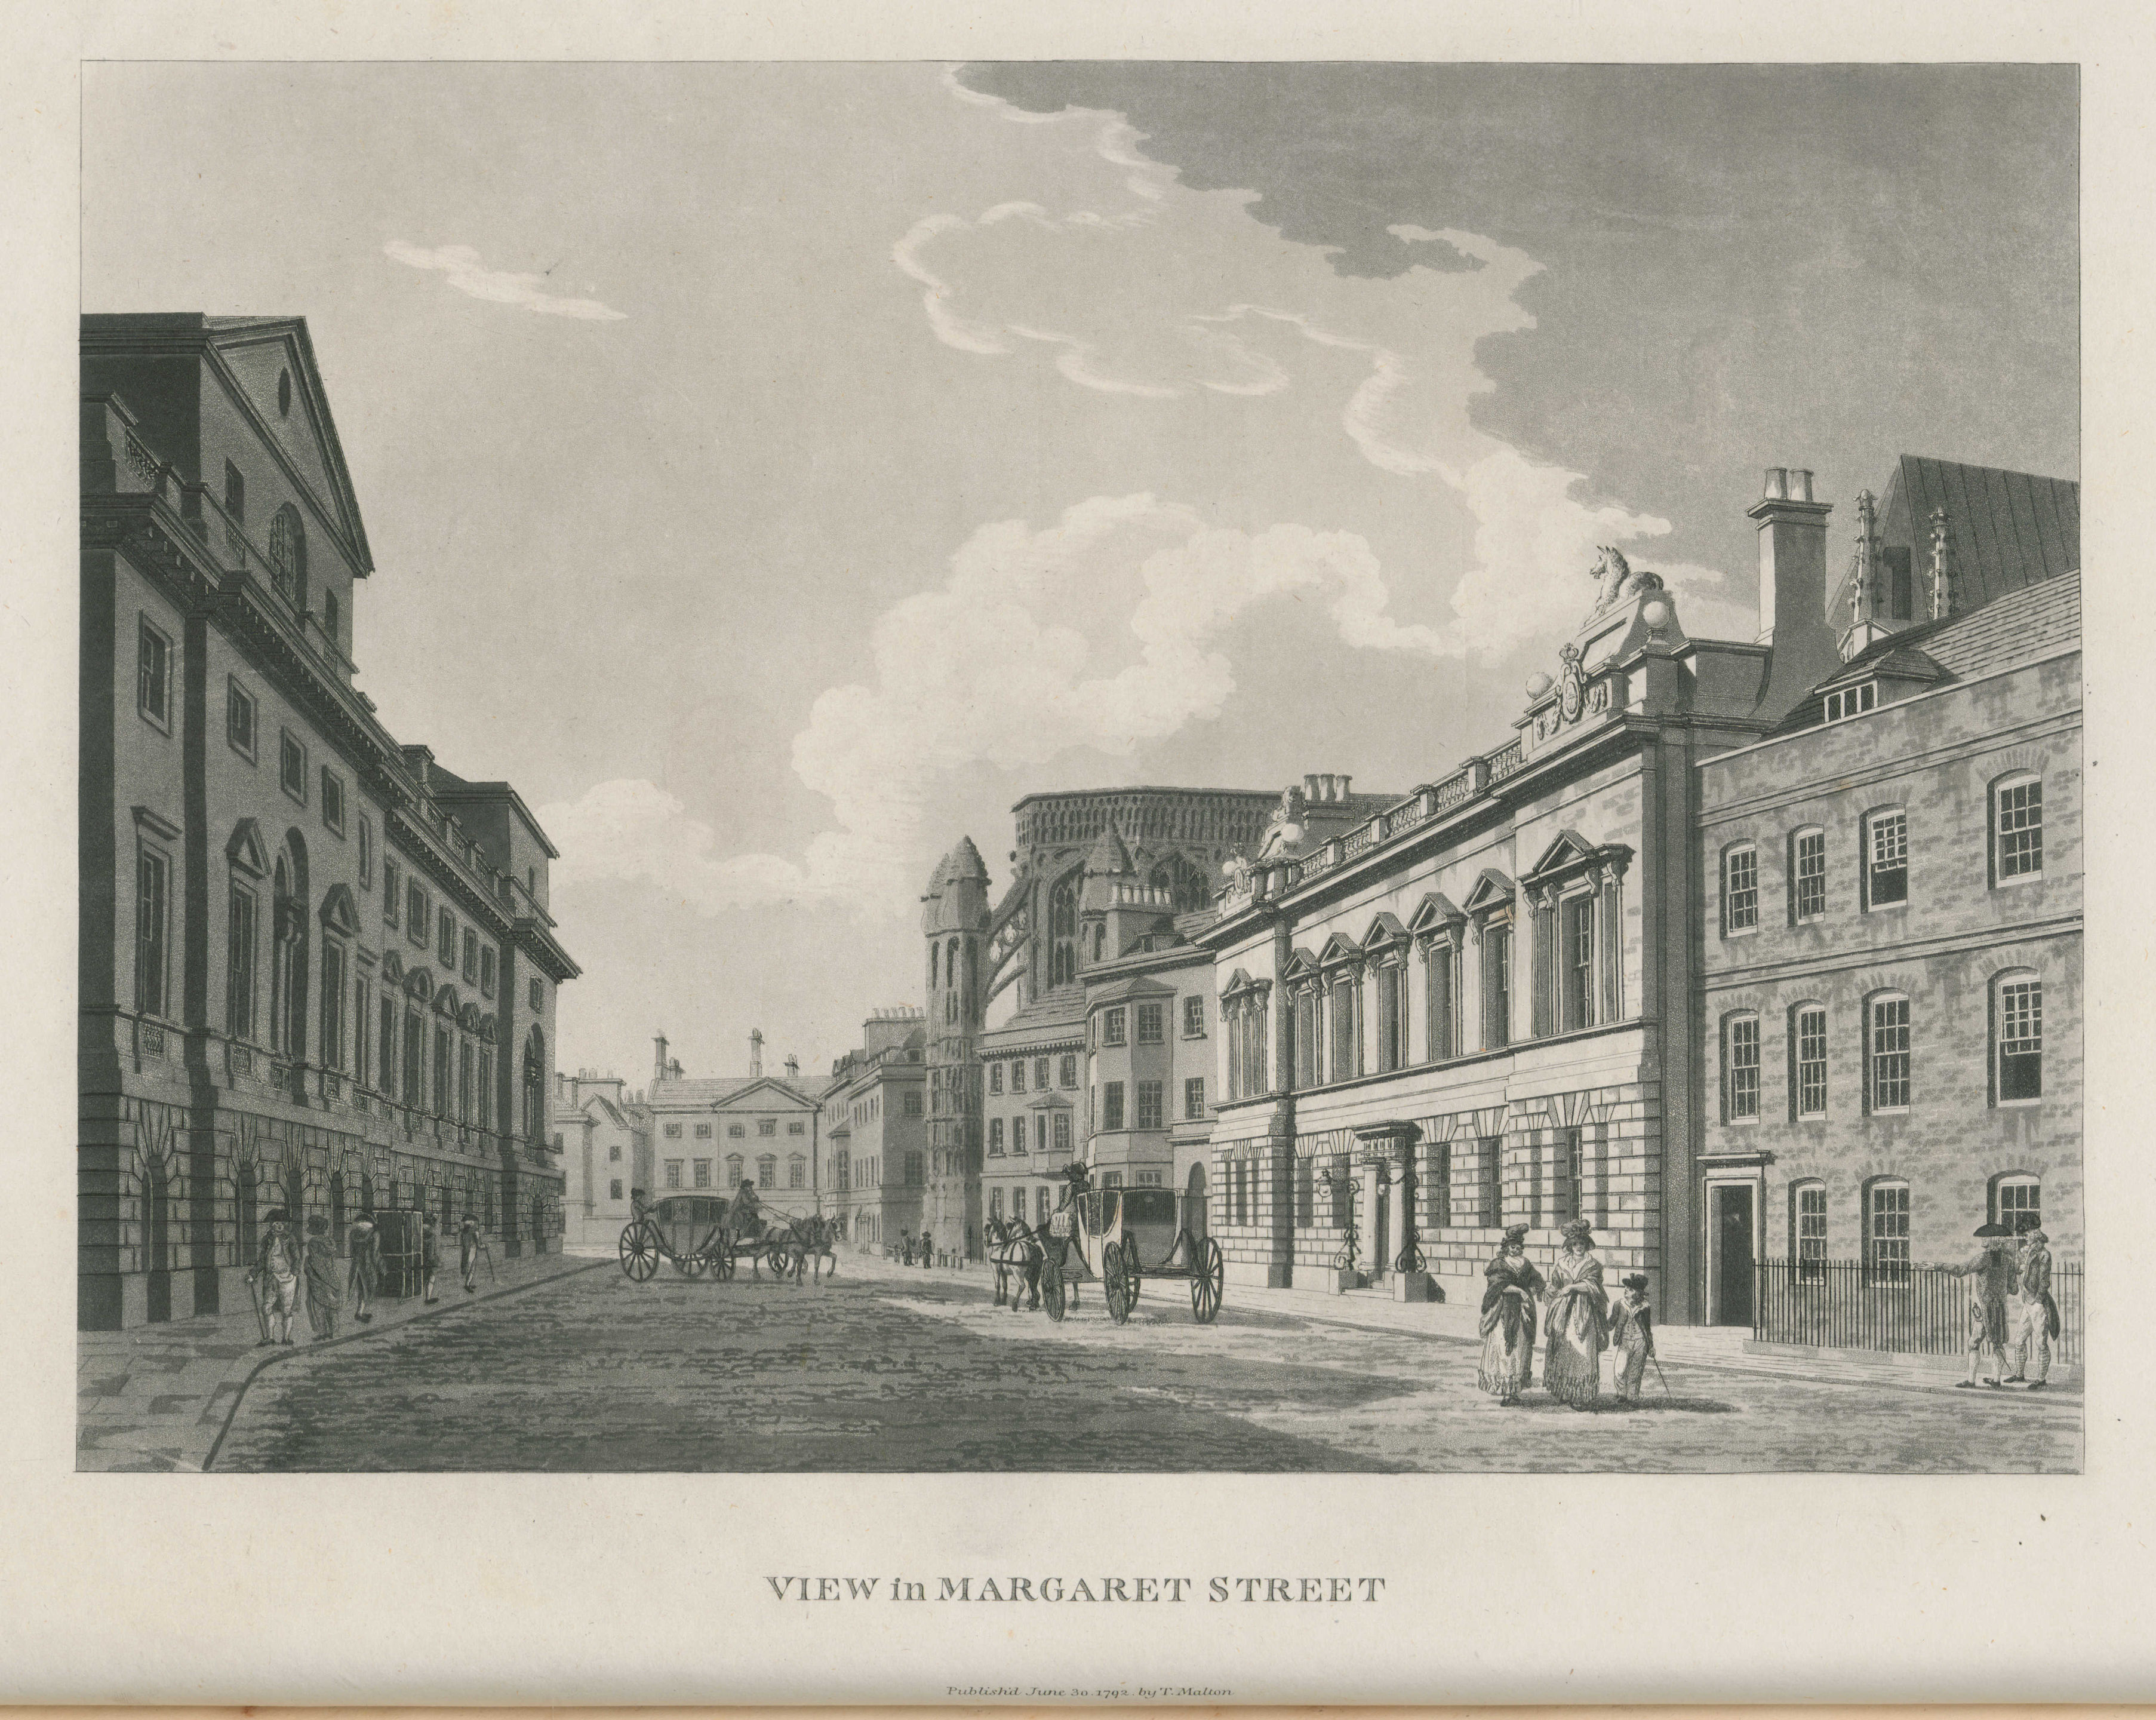 004 - Malton - View in Margaret Street